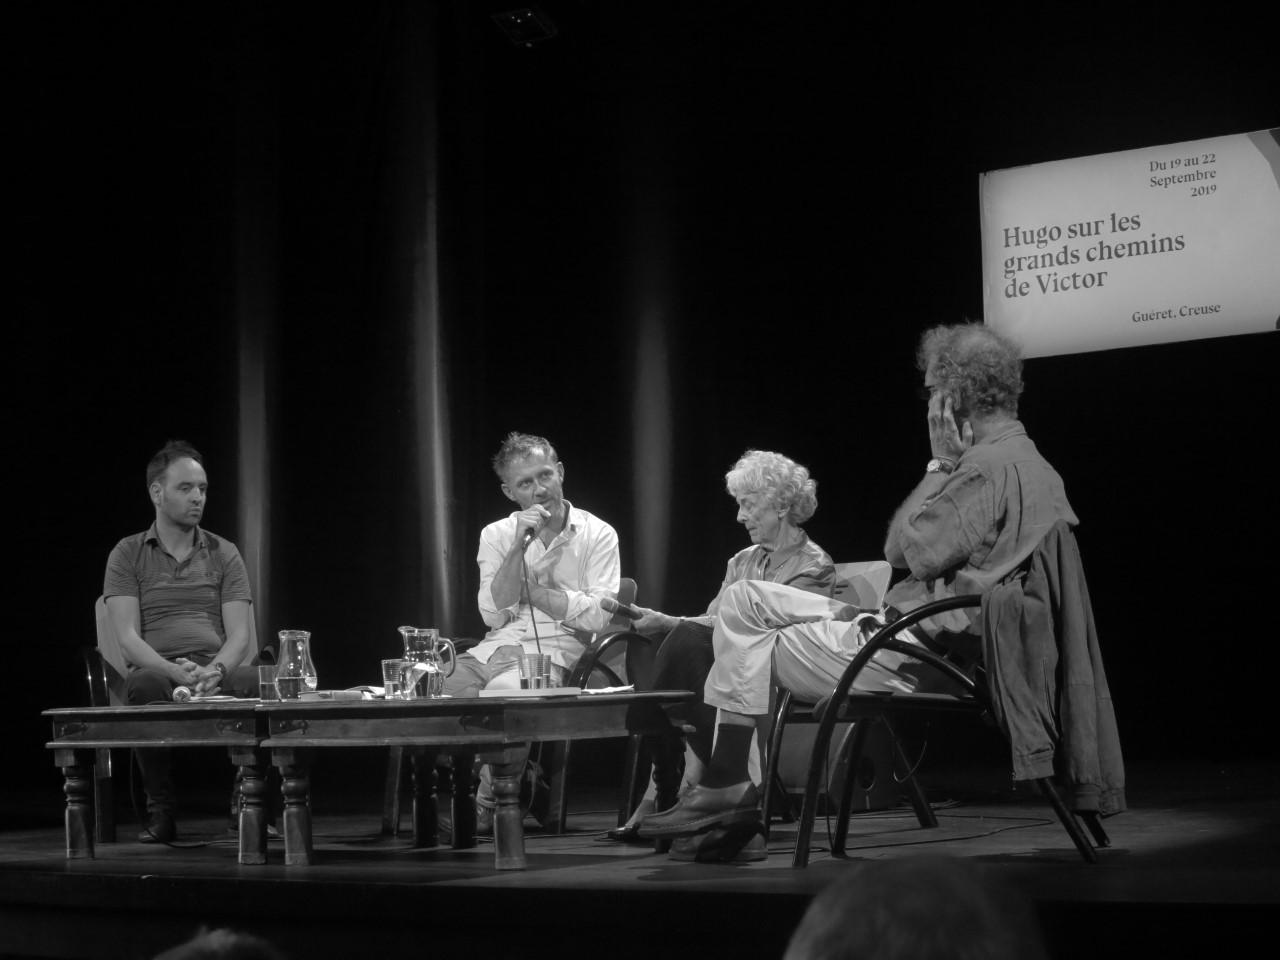 De gauche à droite : Ismaël Jude, Arno Bertina, Mona Ozouf et Édouard Launet ©idlt-Chaminadour